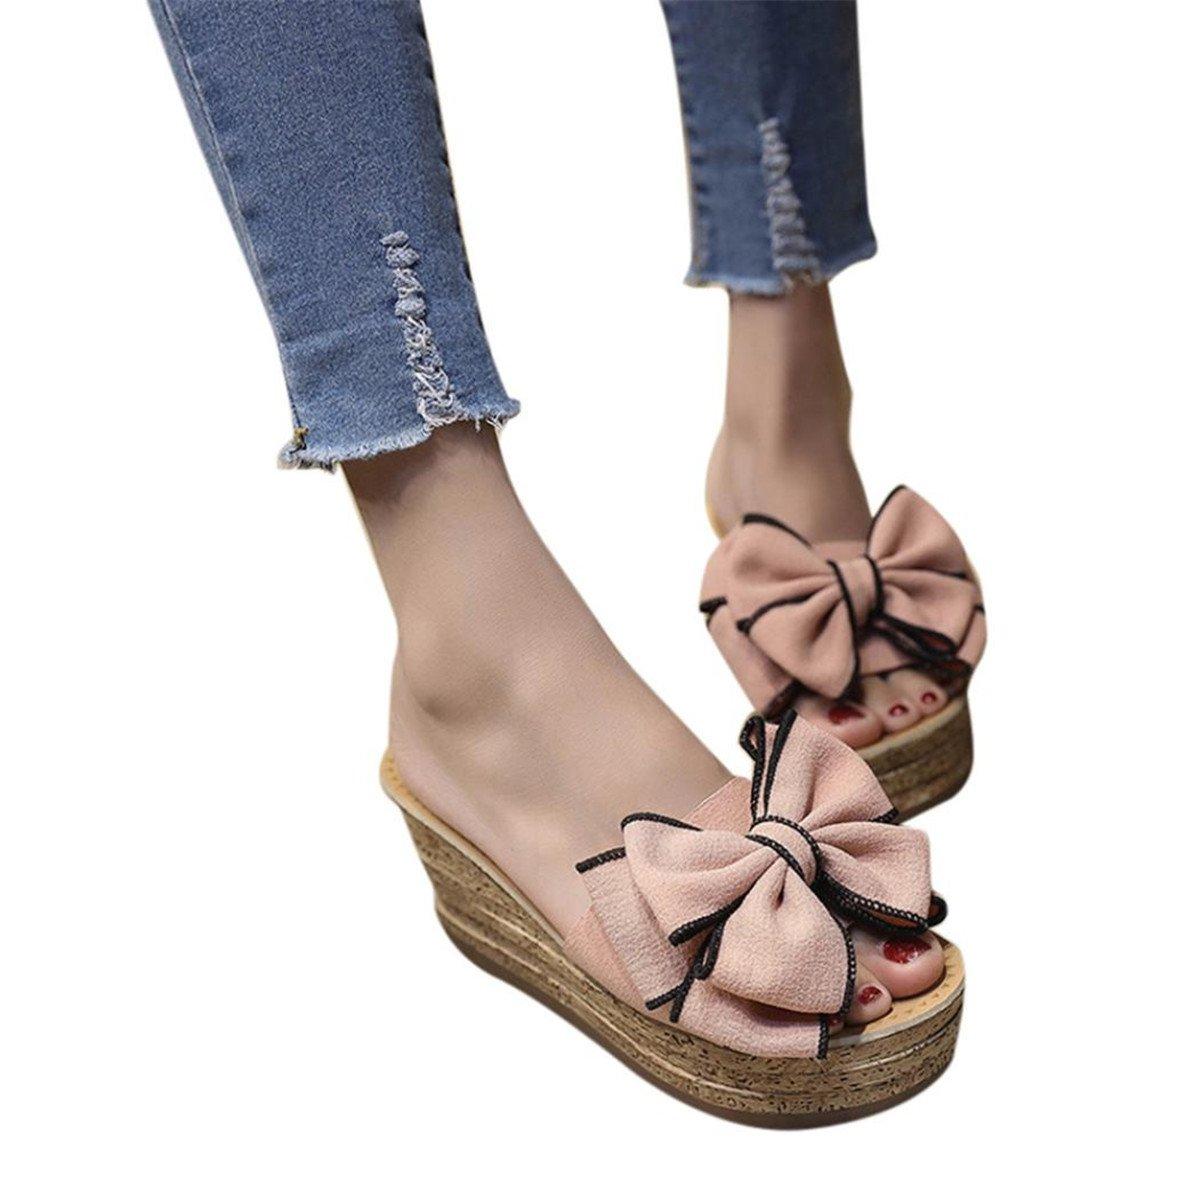 KESEELY Fashional Hight Heels Slipper Women Bow Wedges Slipper Sandals Kitten Heels Shoes For Summer (US:7, Pink)